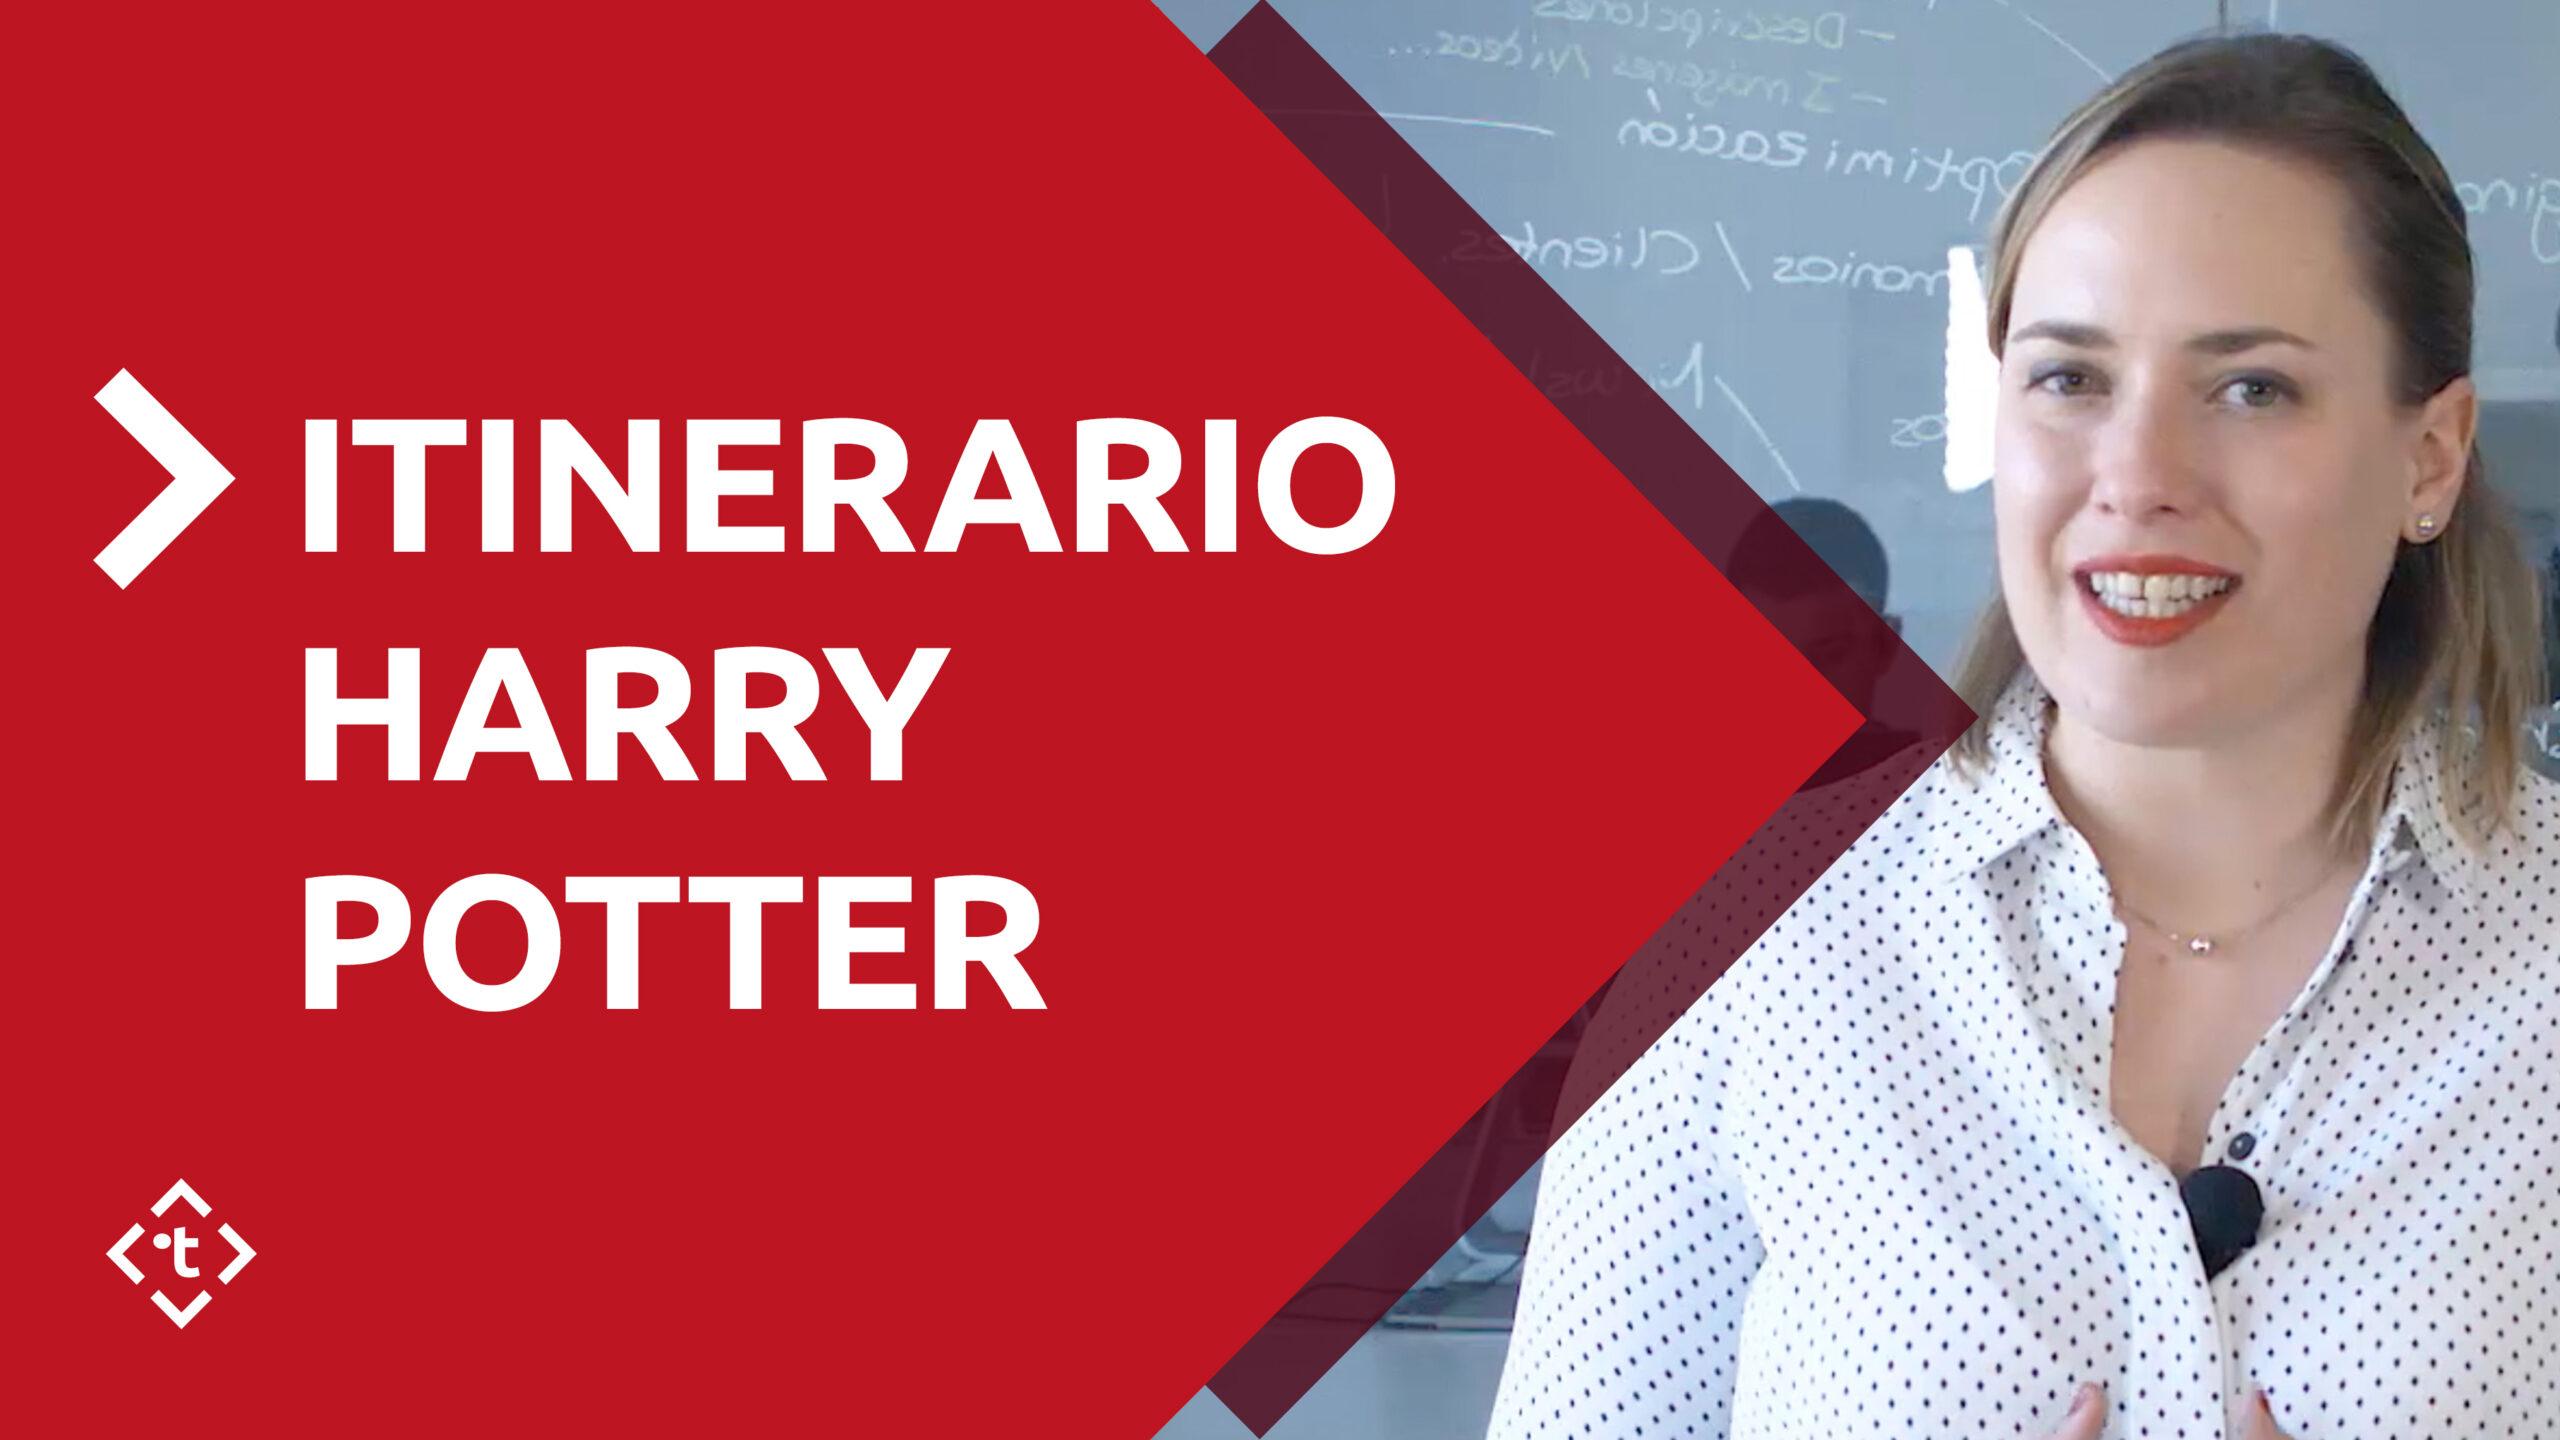 ITINERARIO DE HARRY POTTER